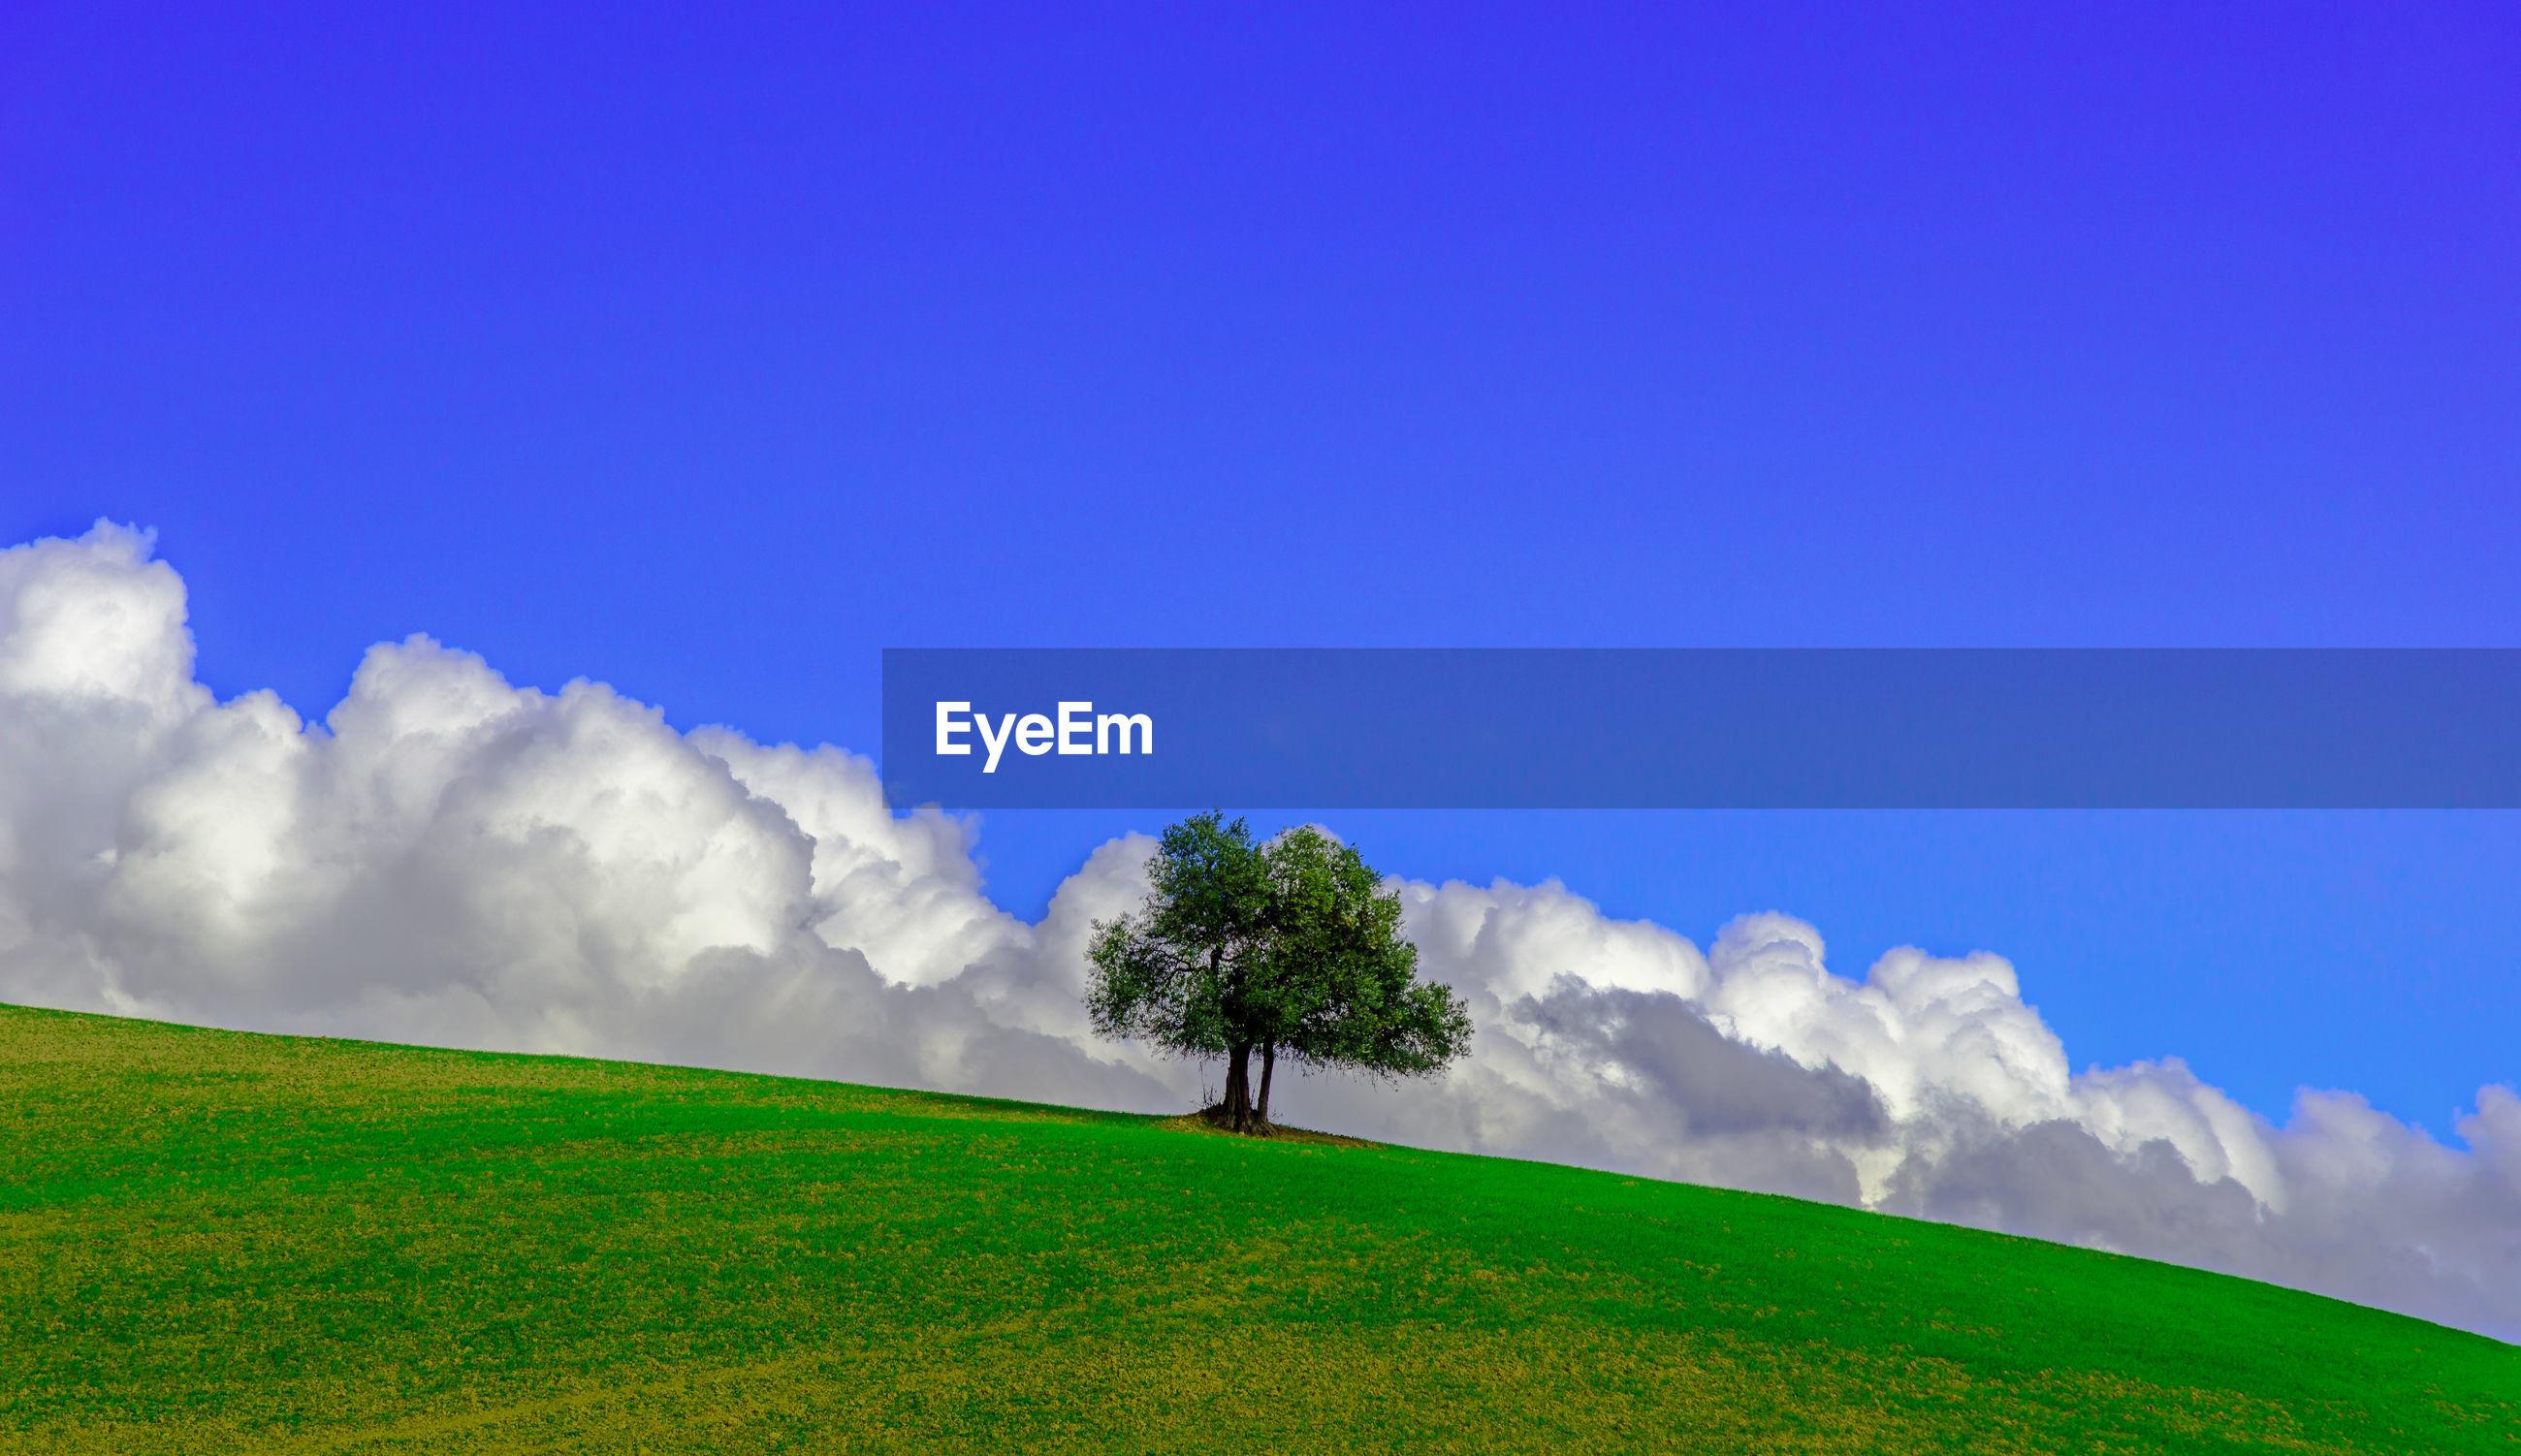 TREE ON FIELD AGAINST BLUE SKY